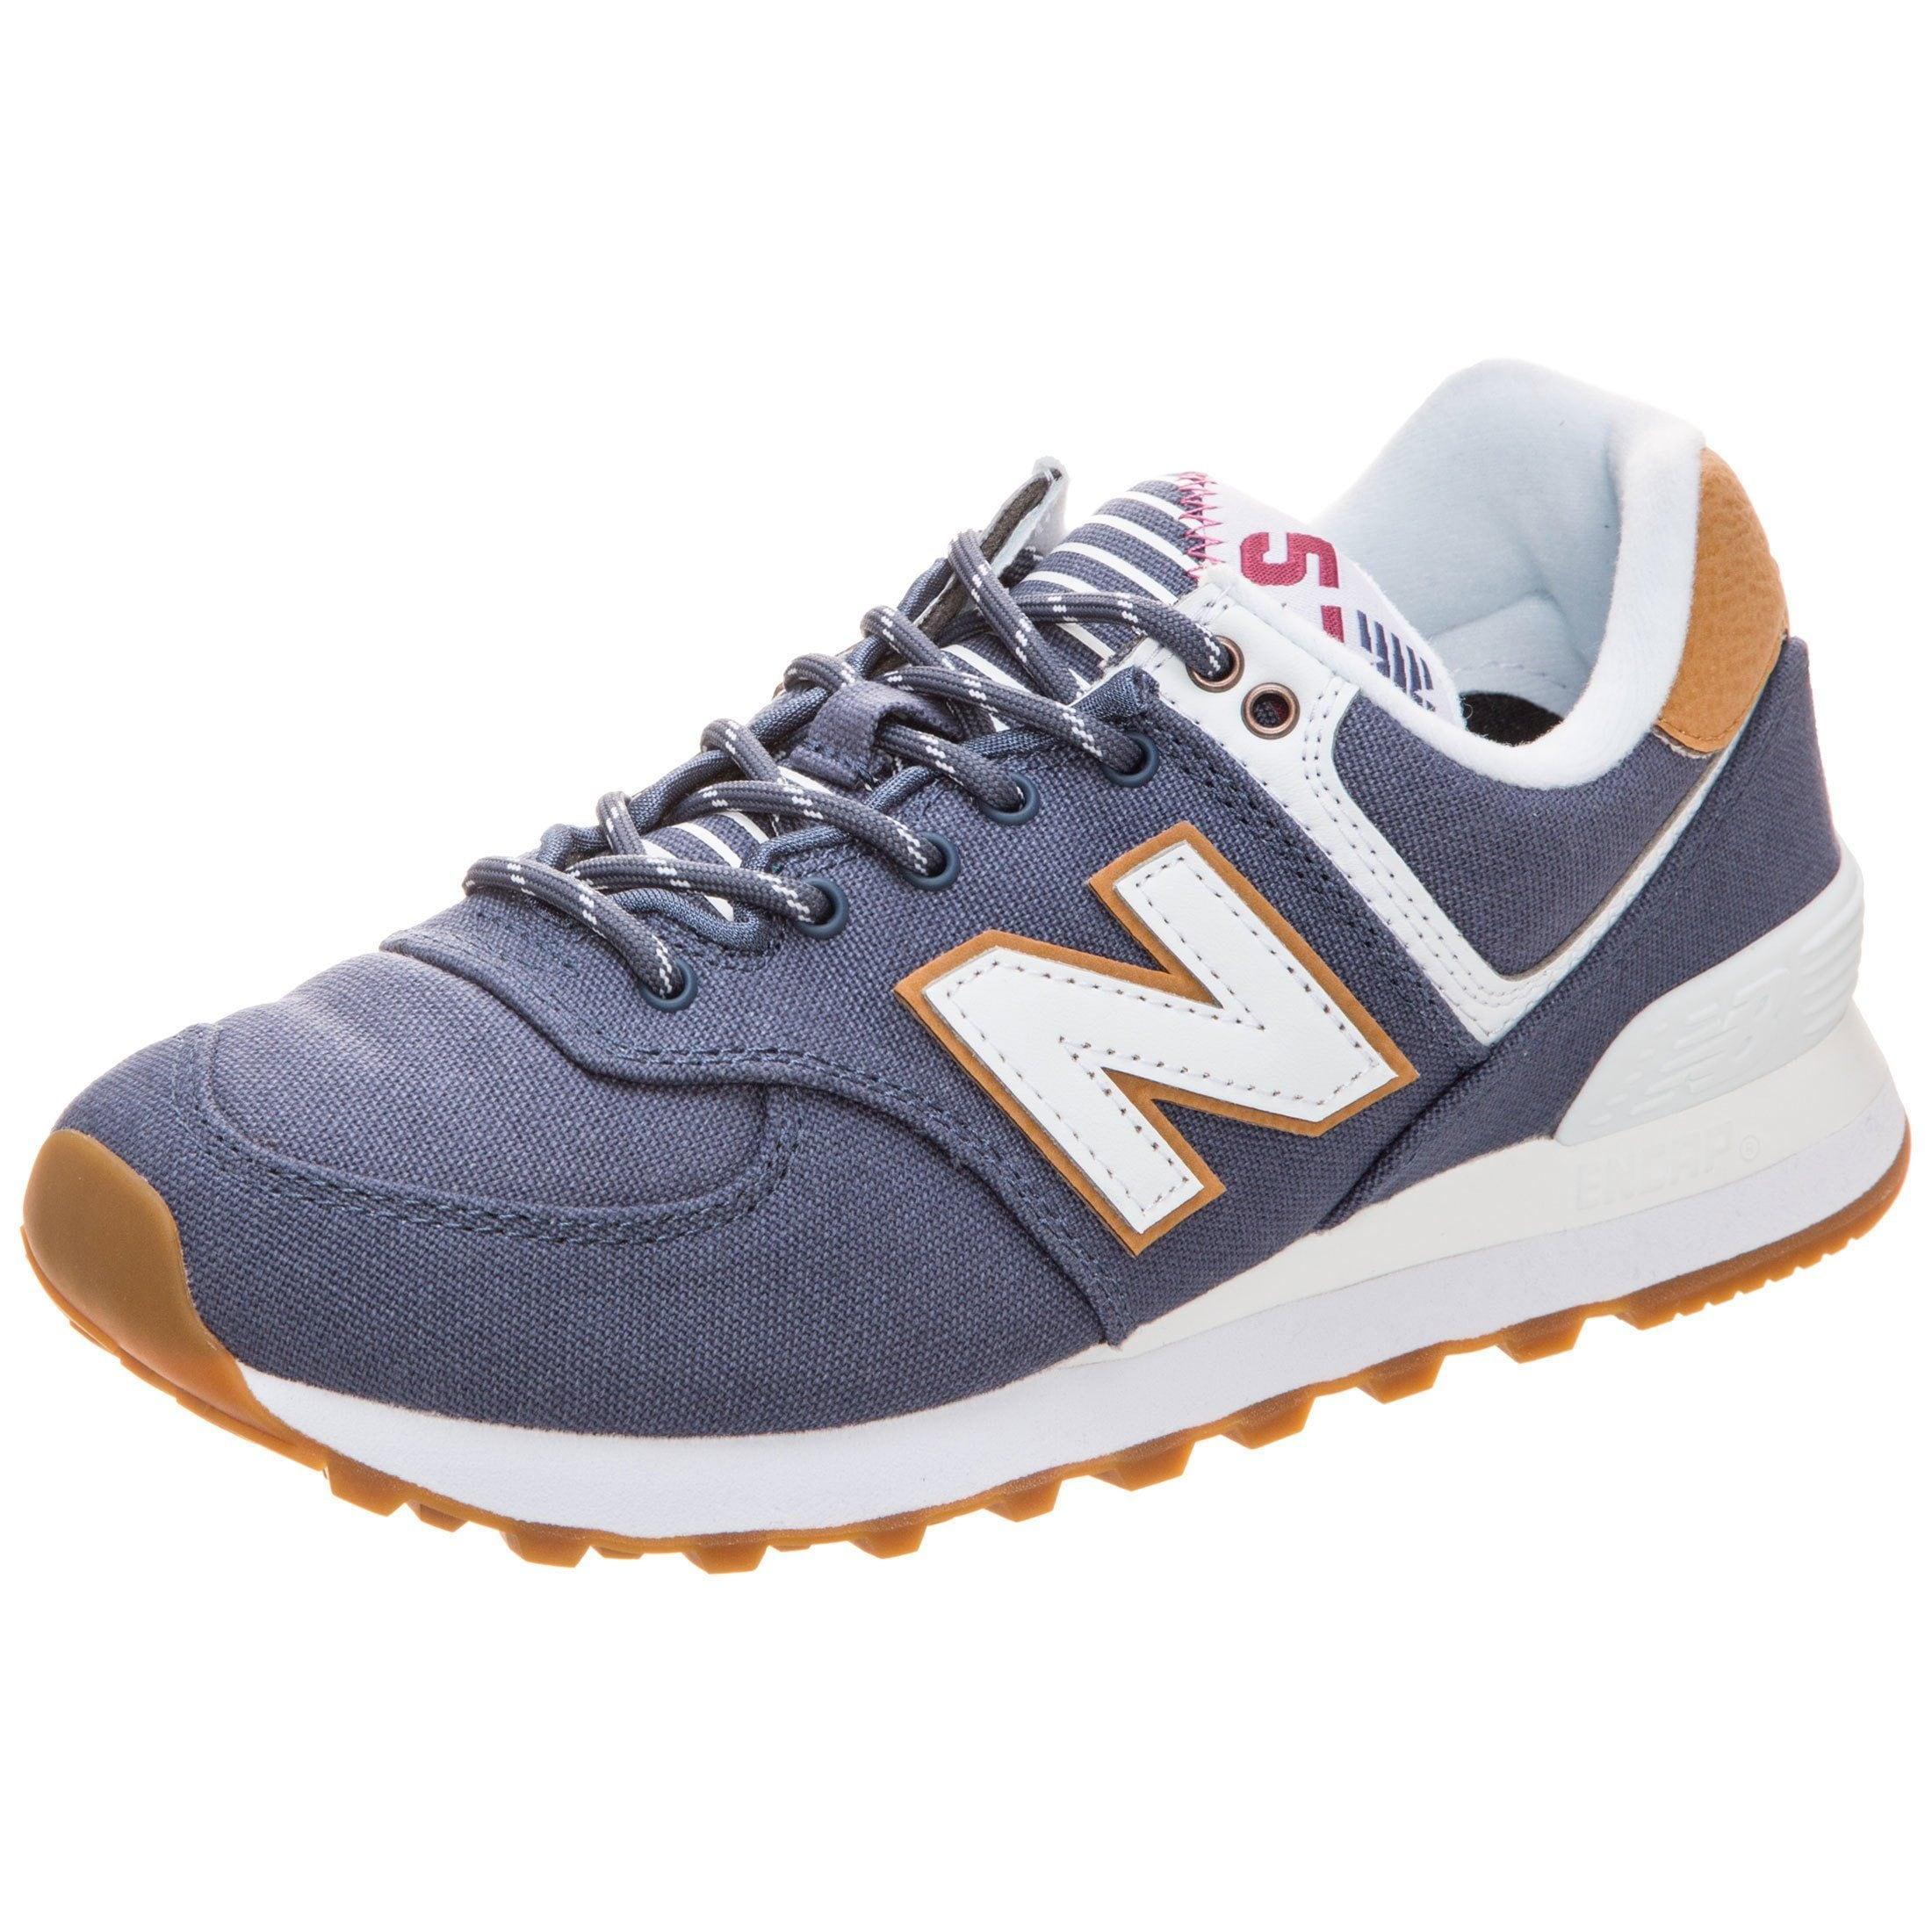 New New New Balance Sneaker  ;Wl574-syd-b für Damen bei Imwalking e71cdc